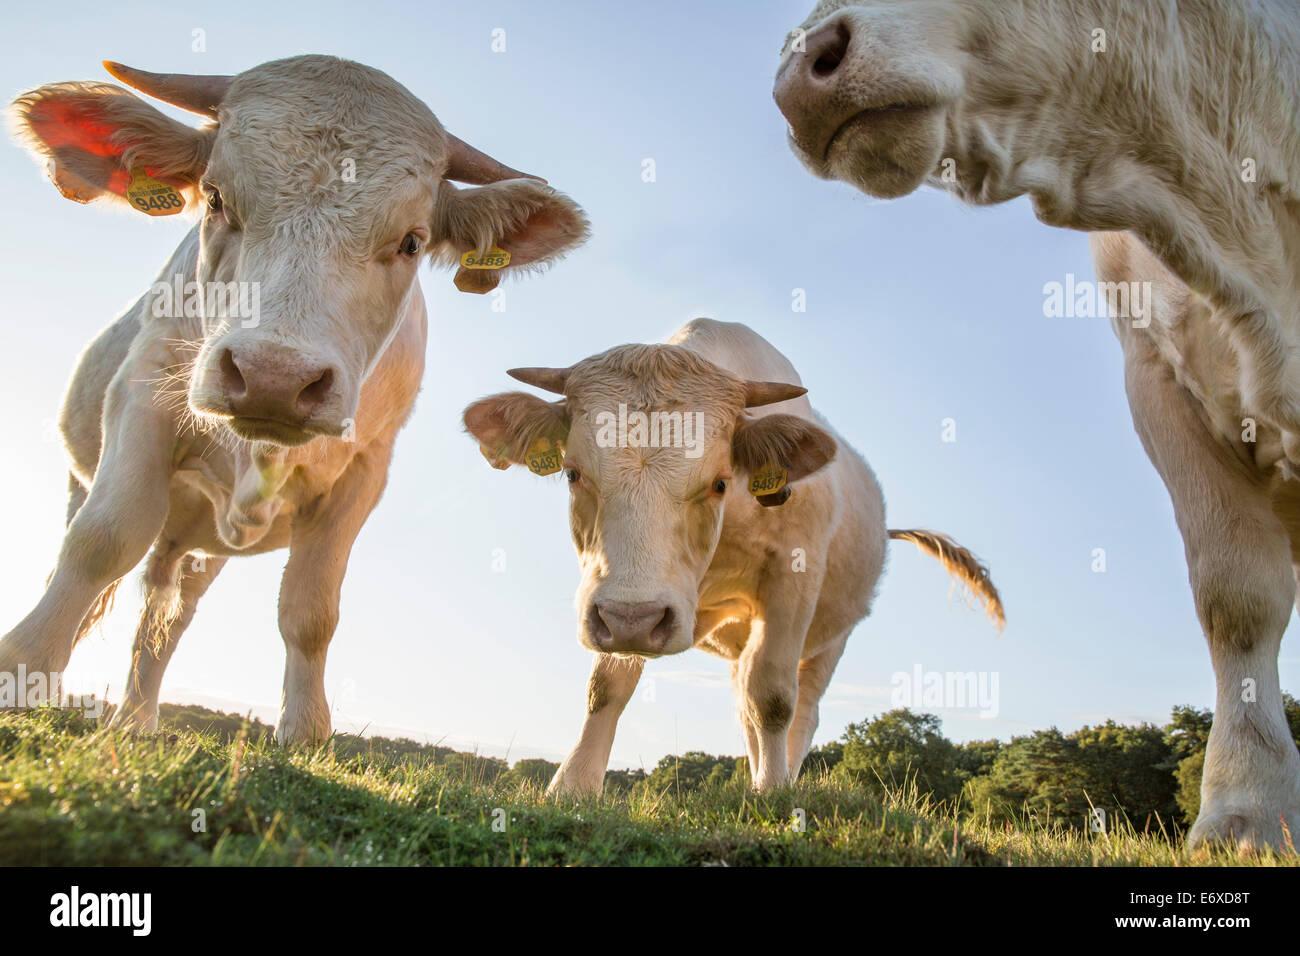 Paesi Bassi, Blaricum, brughiera o brughiera chiamato Tafelbergheide. Charolais bestiame. Giovani tori Immagini Stock